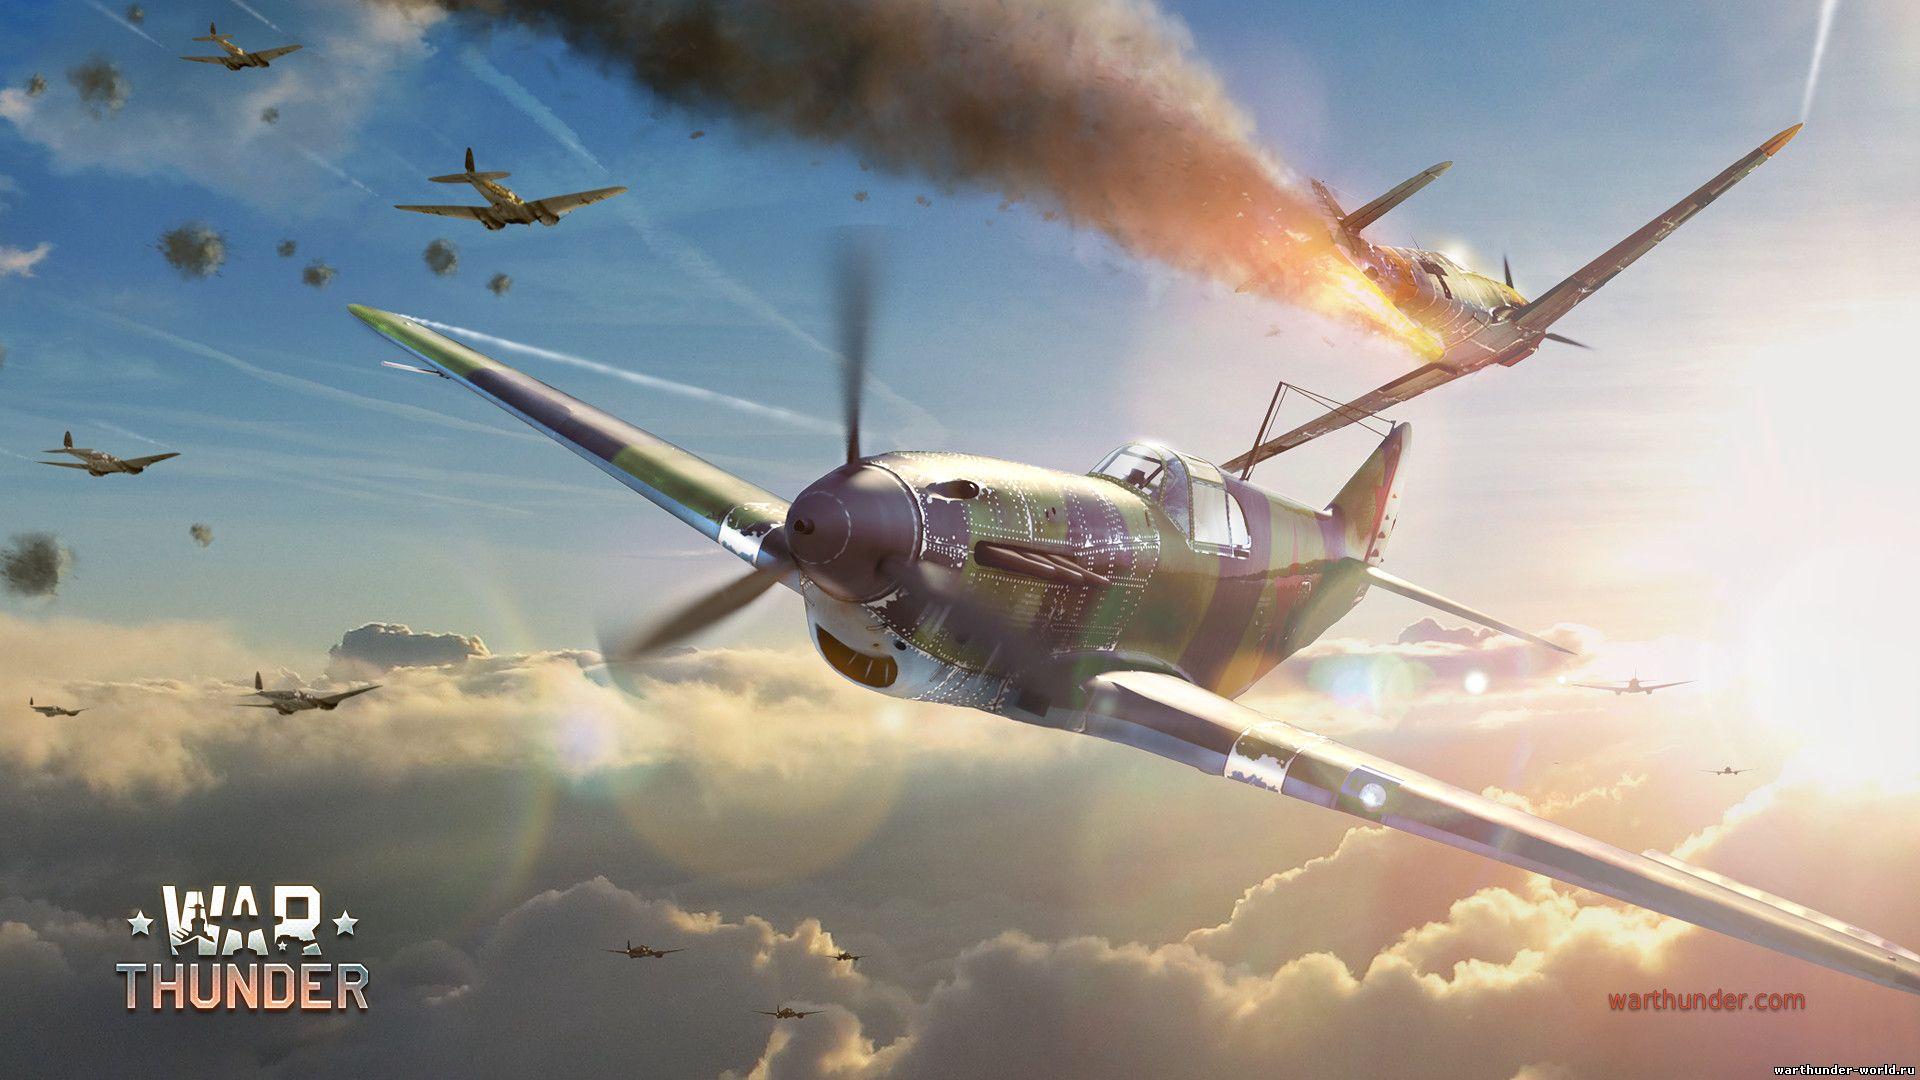 вартандер картинки самолеты